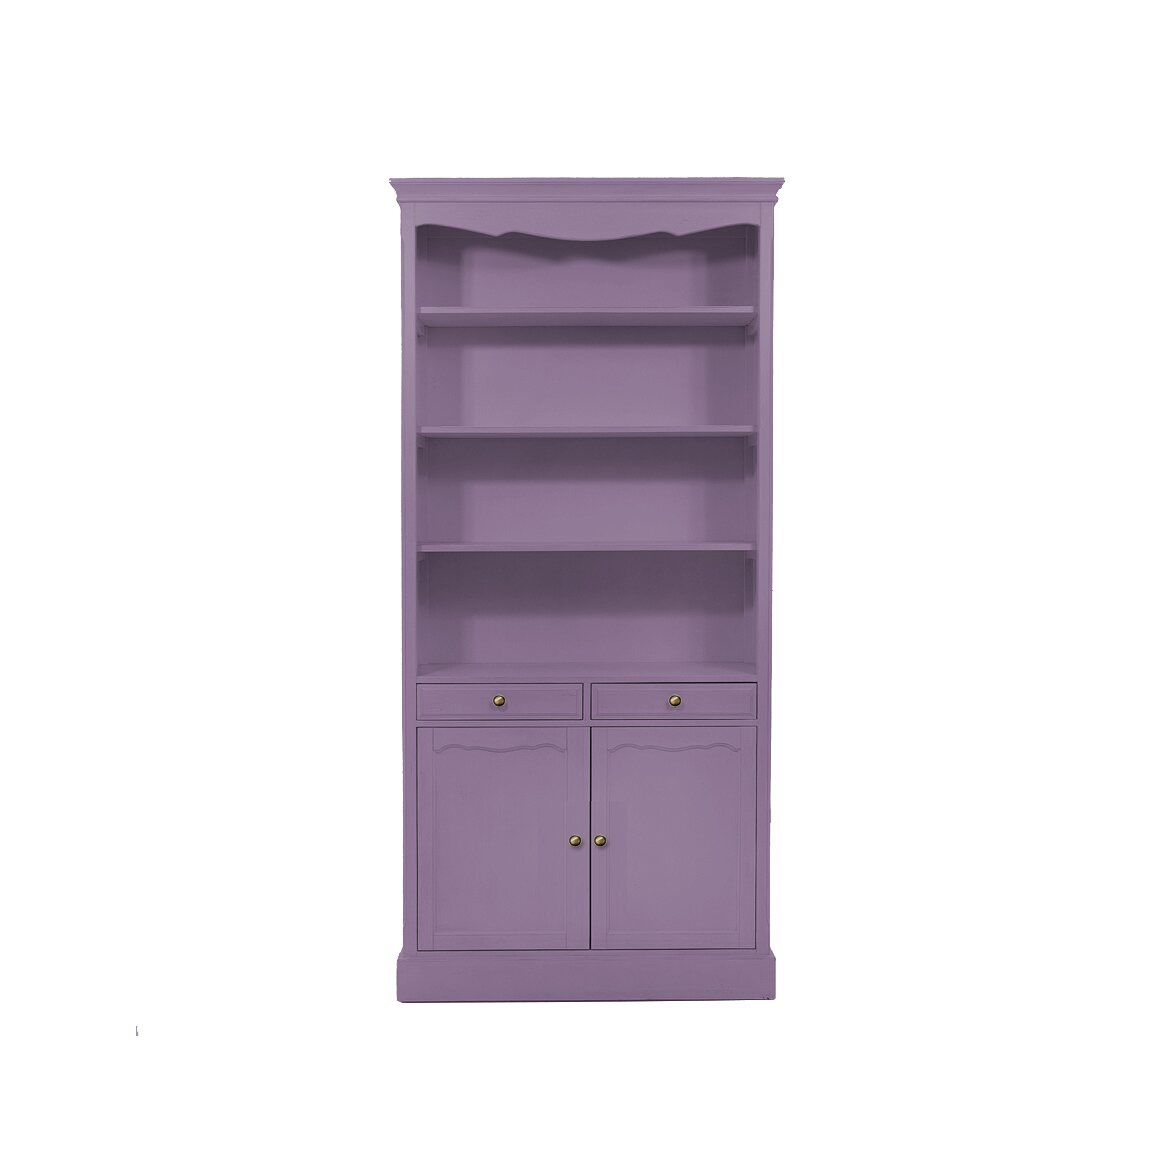 Стеллаж с 2-я ящиками Leontina, лавандового цвета | Стеллажи Kingsby